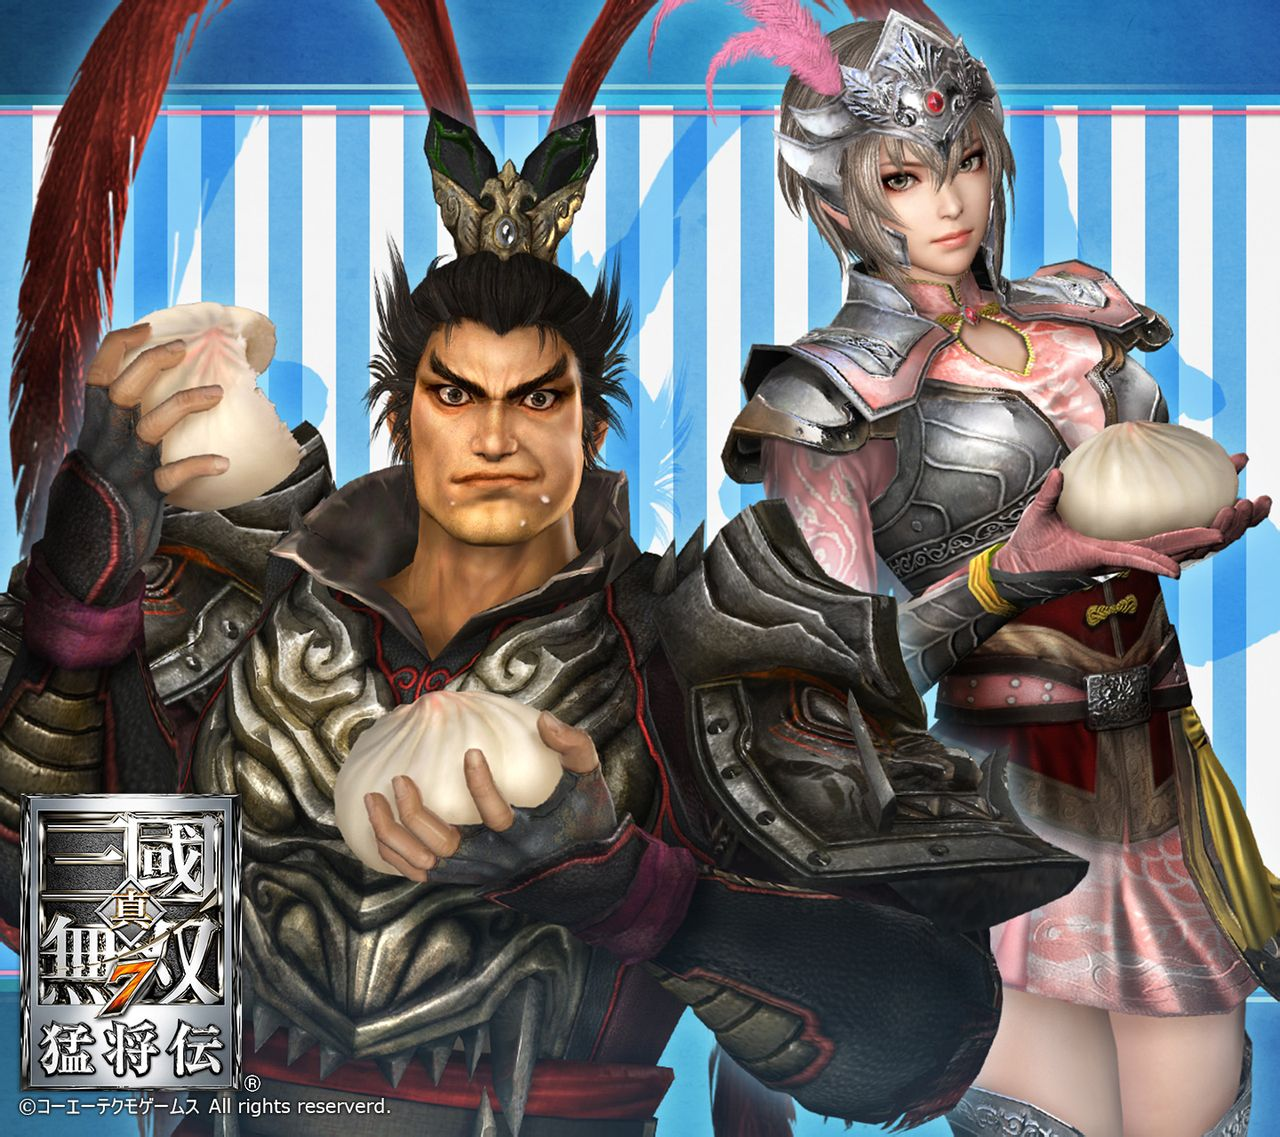 Lu Bu Warriors Orochi 3 Ultimate: Meatbun Phone Wallpaper 02.jpg